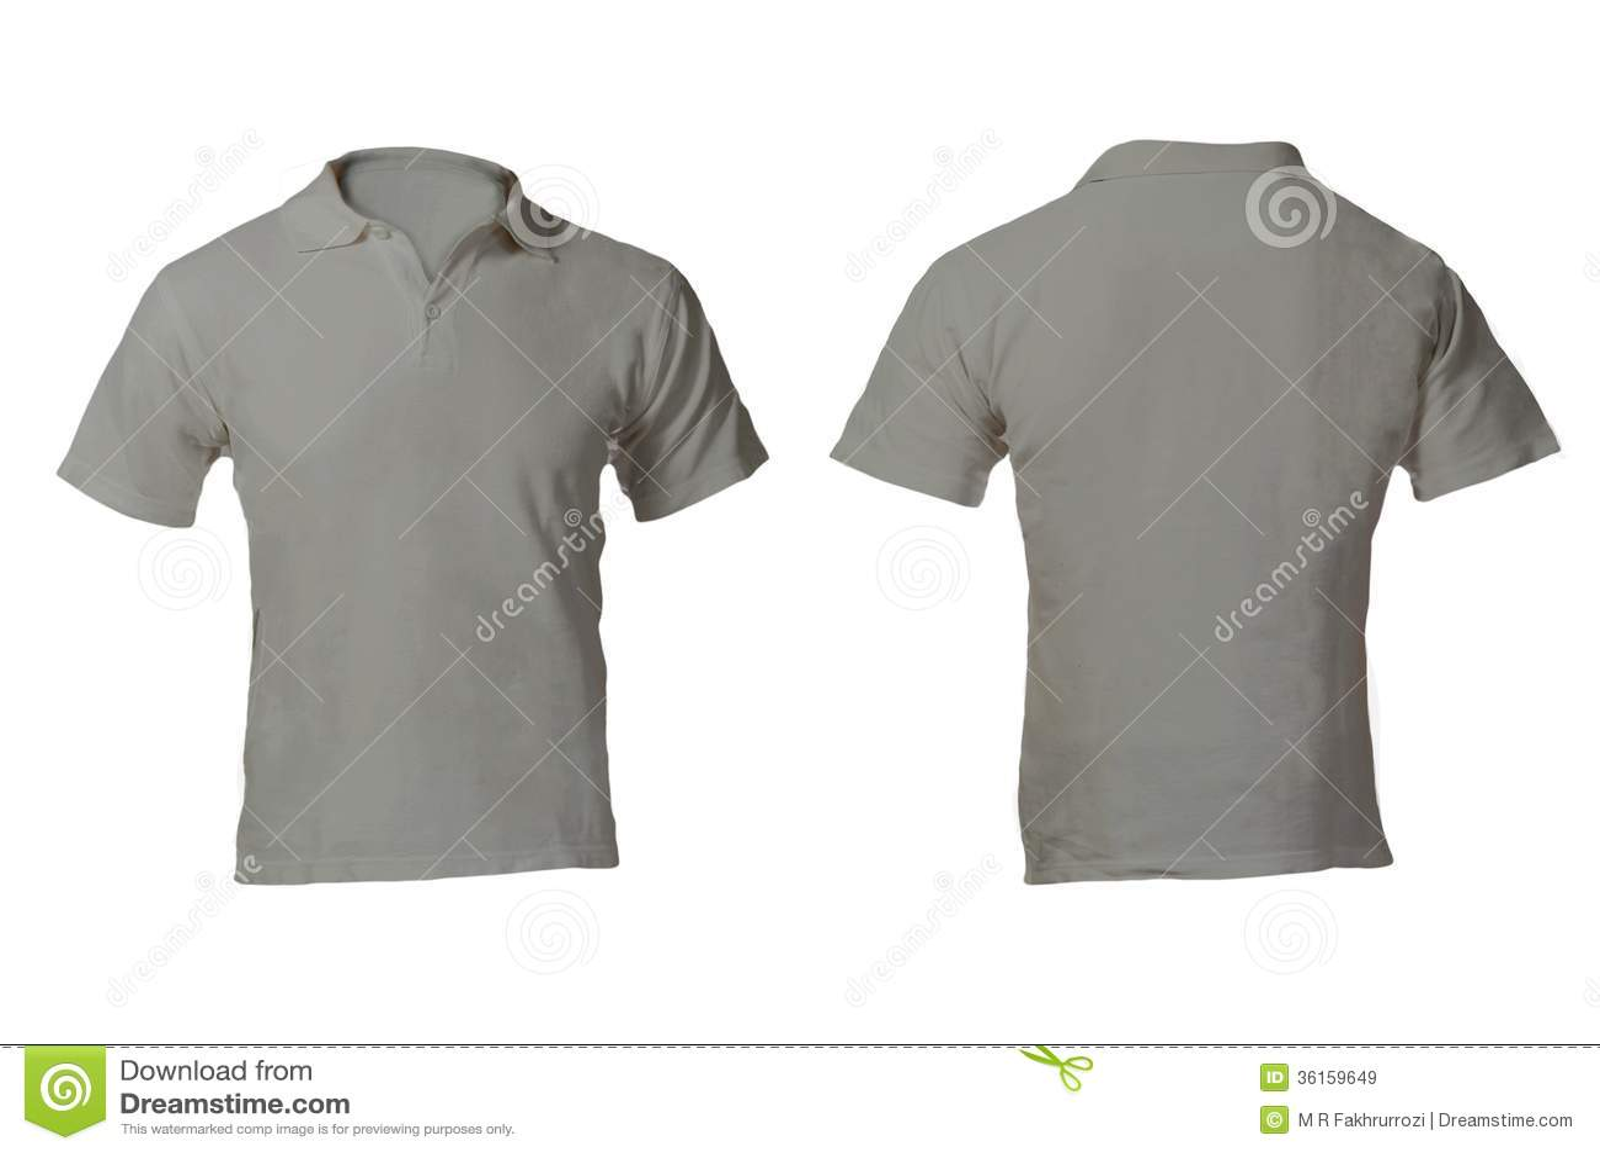 Download Leerer Grey Polo Shirt Template Der Manner Stockbild